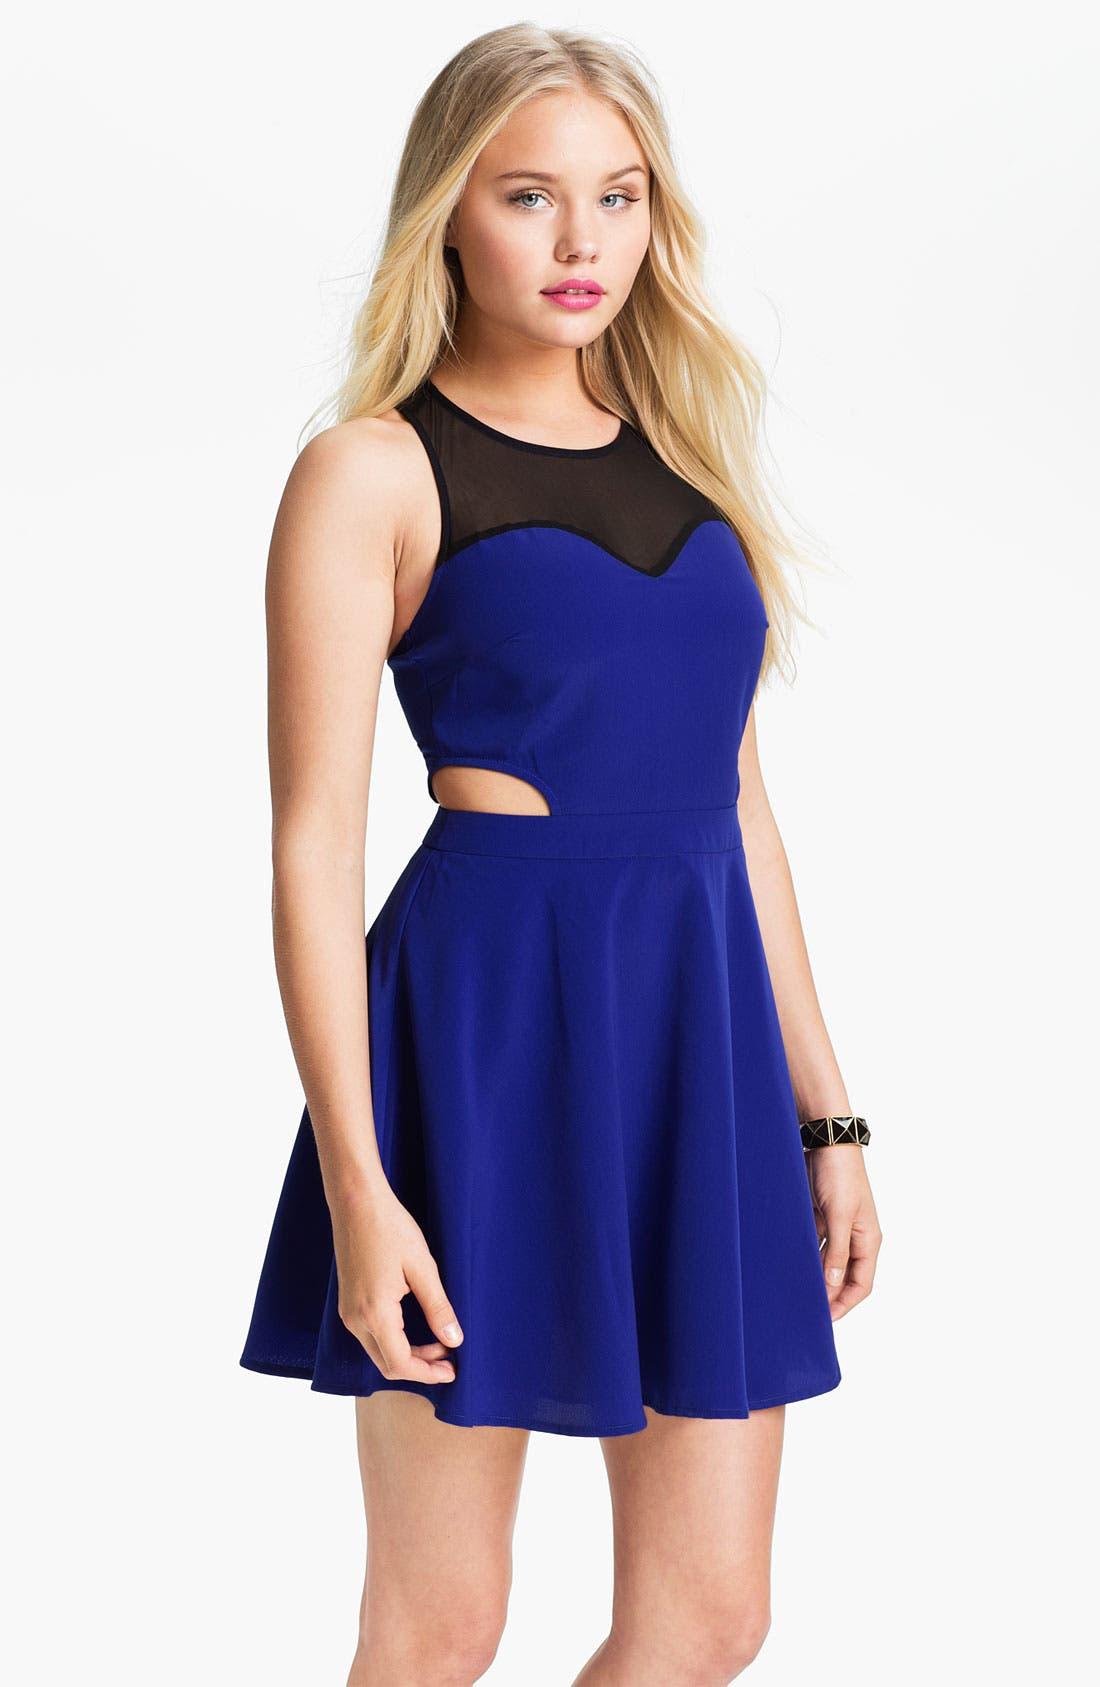 Main Image - Lush Clothing Mesh Illusion Cutout Skater Dress (Juniors)